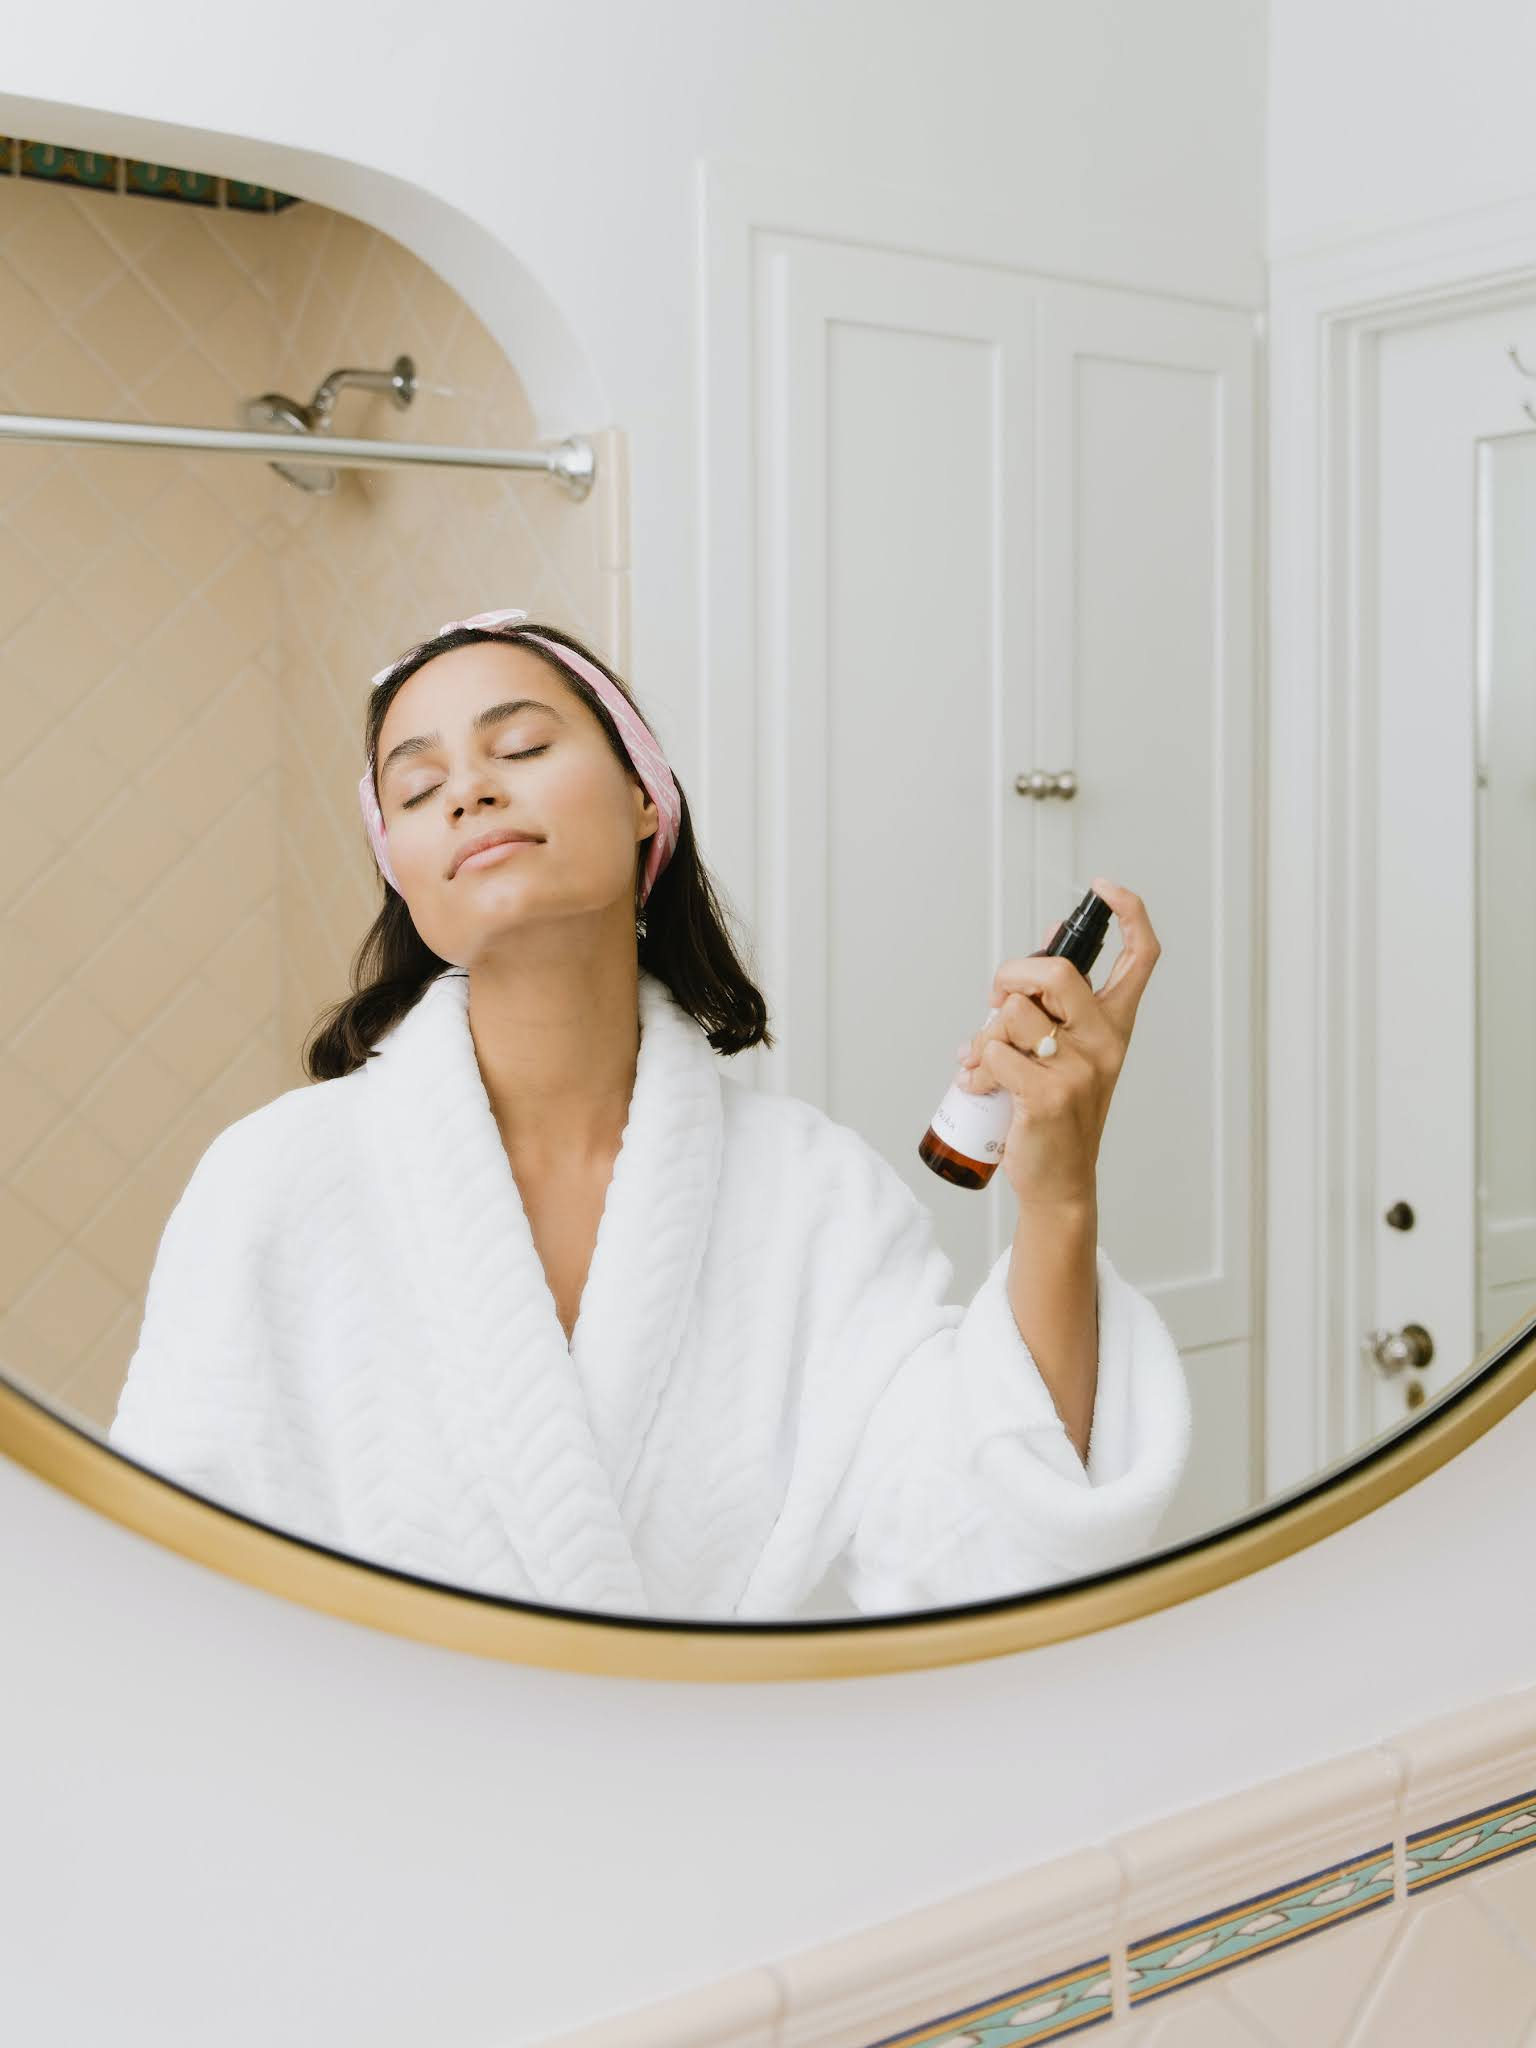 New Season Skin! 4 Essential Autumn Beauty Tricks